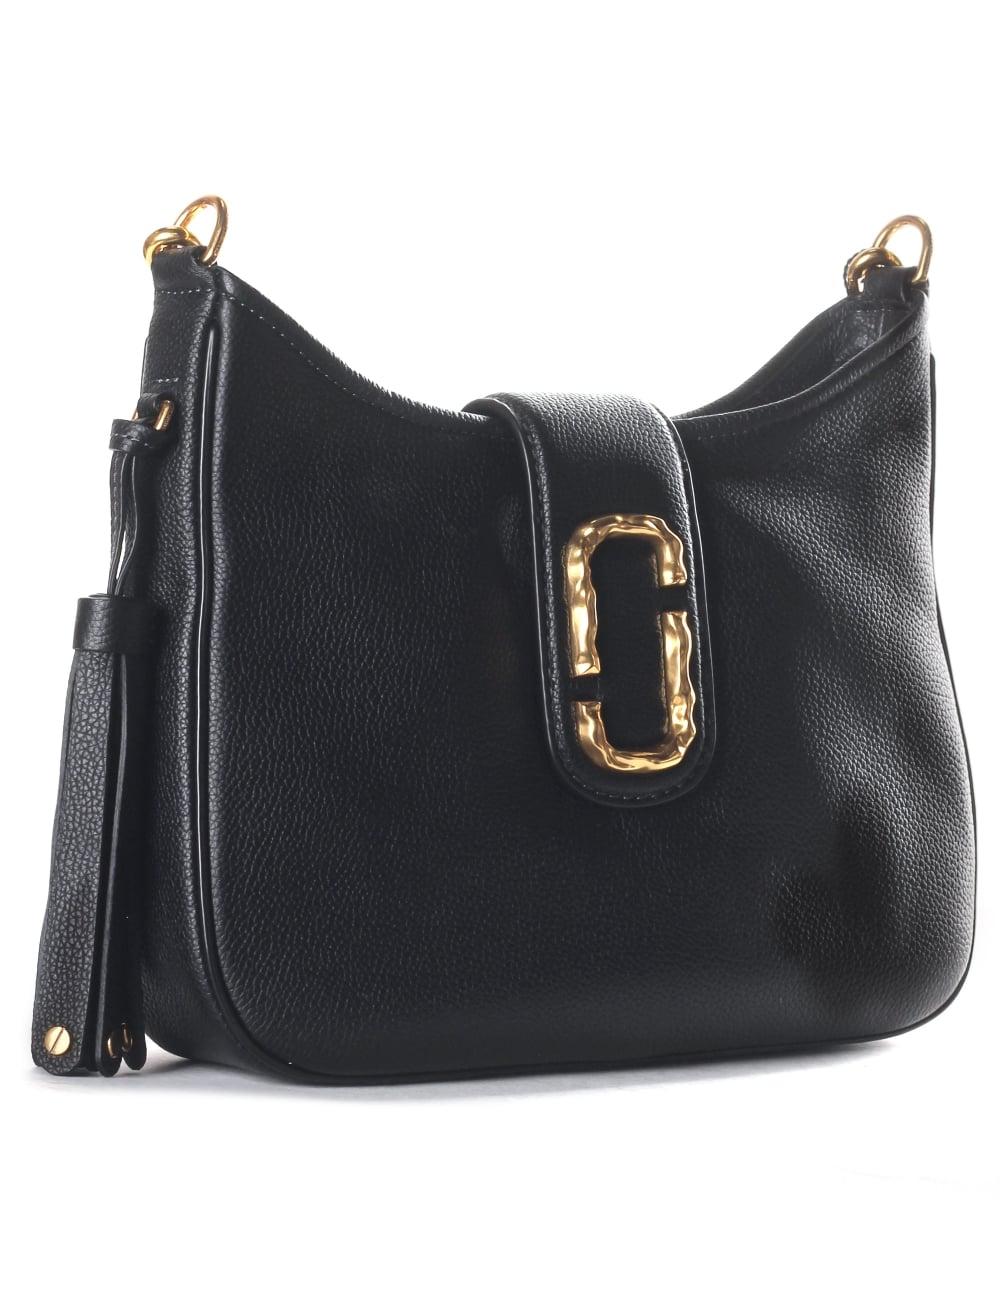 ed39e559d656 Marc Jacobs Interlock Women s Small Hobo Bag Black